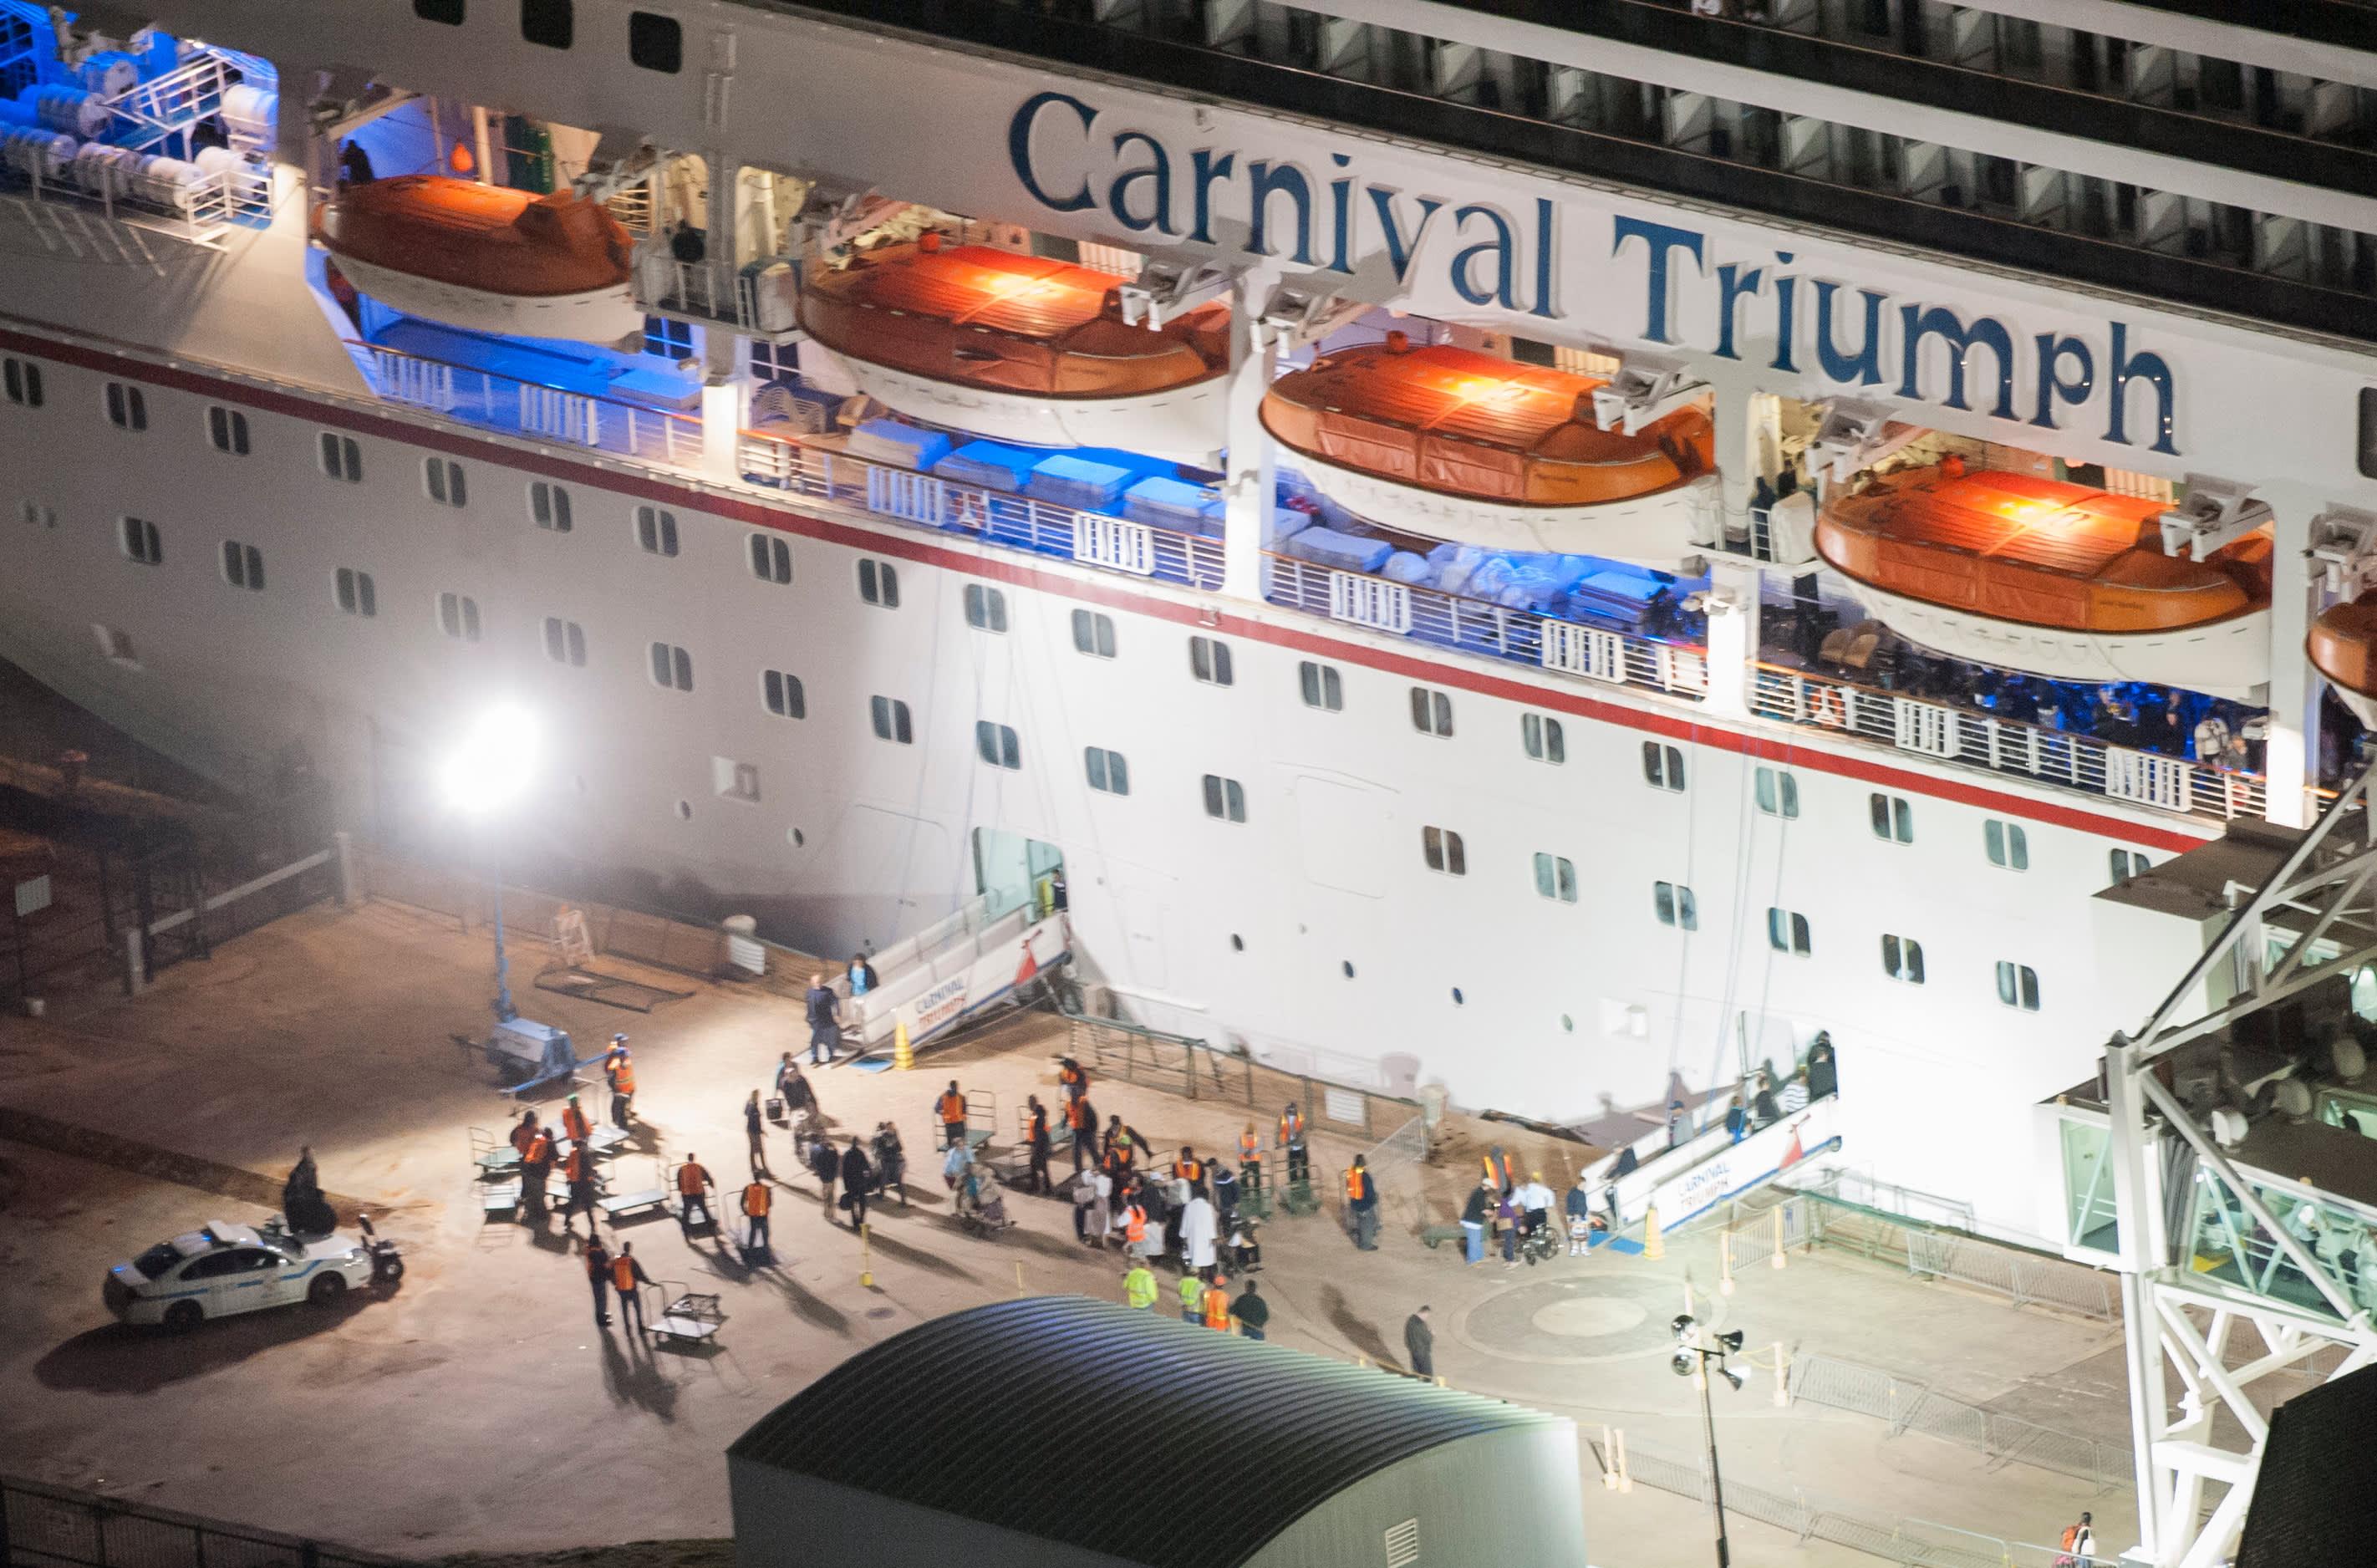 Carnival cruise ship triumph disaster